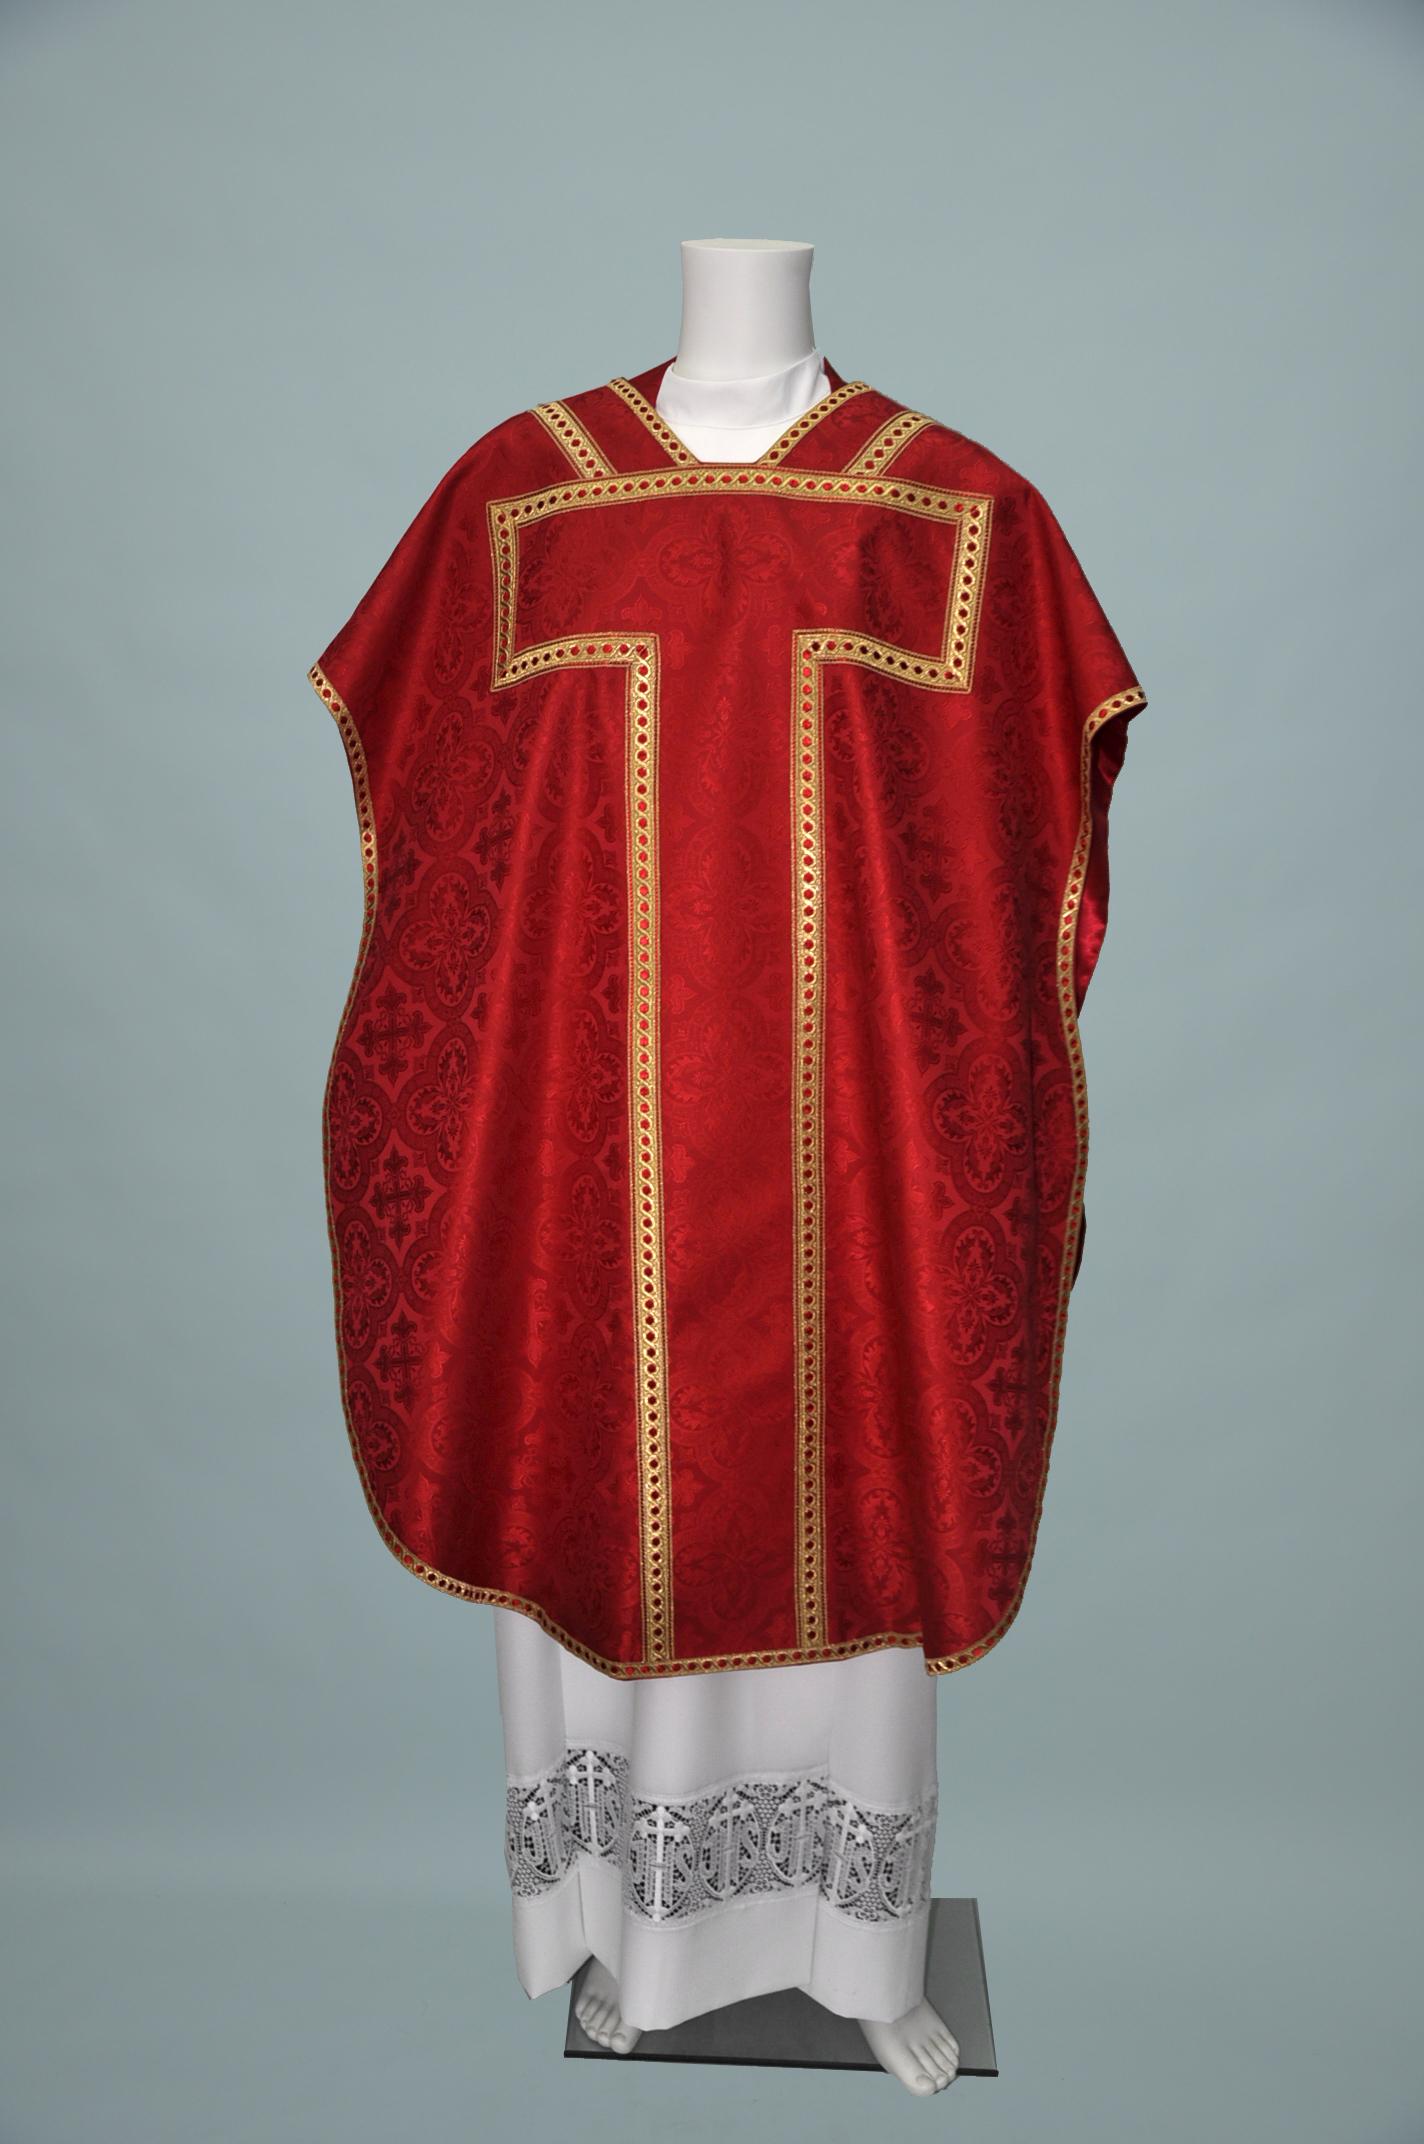 St Philip Neri Davinci Red W 2326 red gold (f)1.jpg